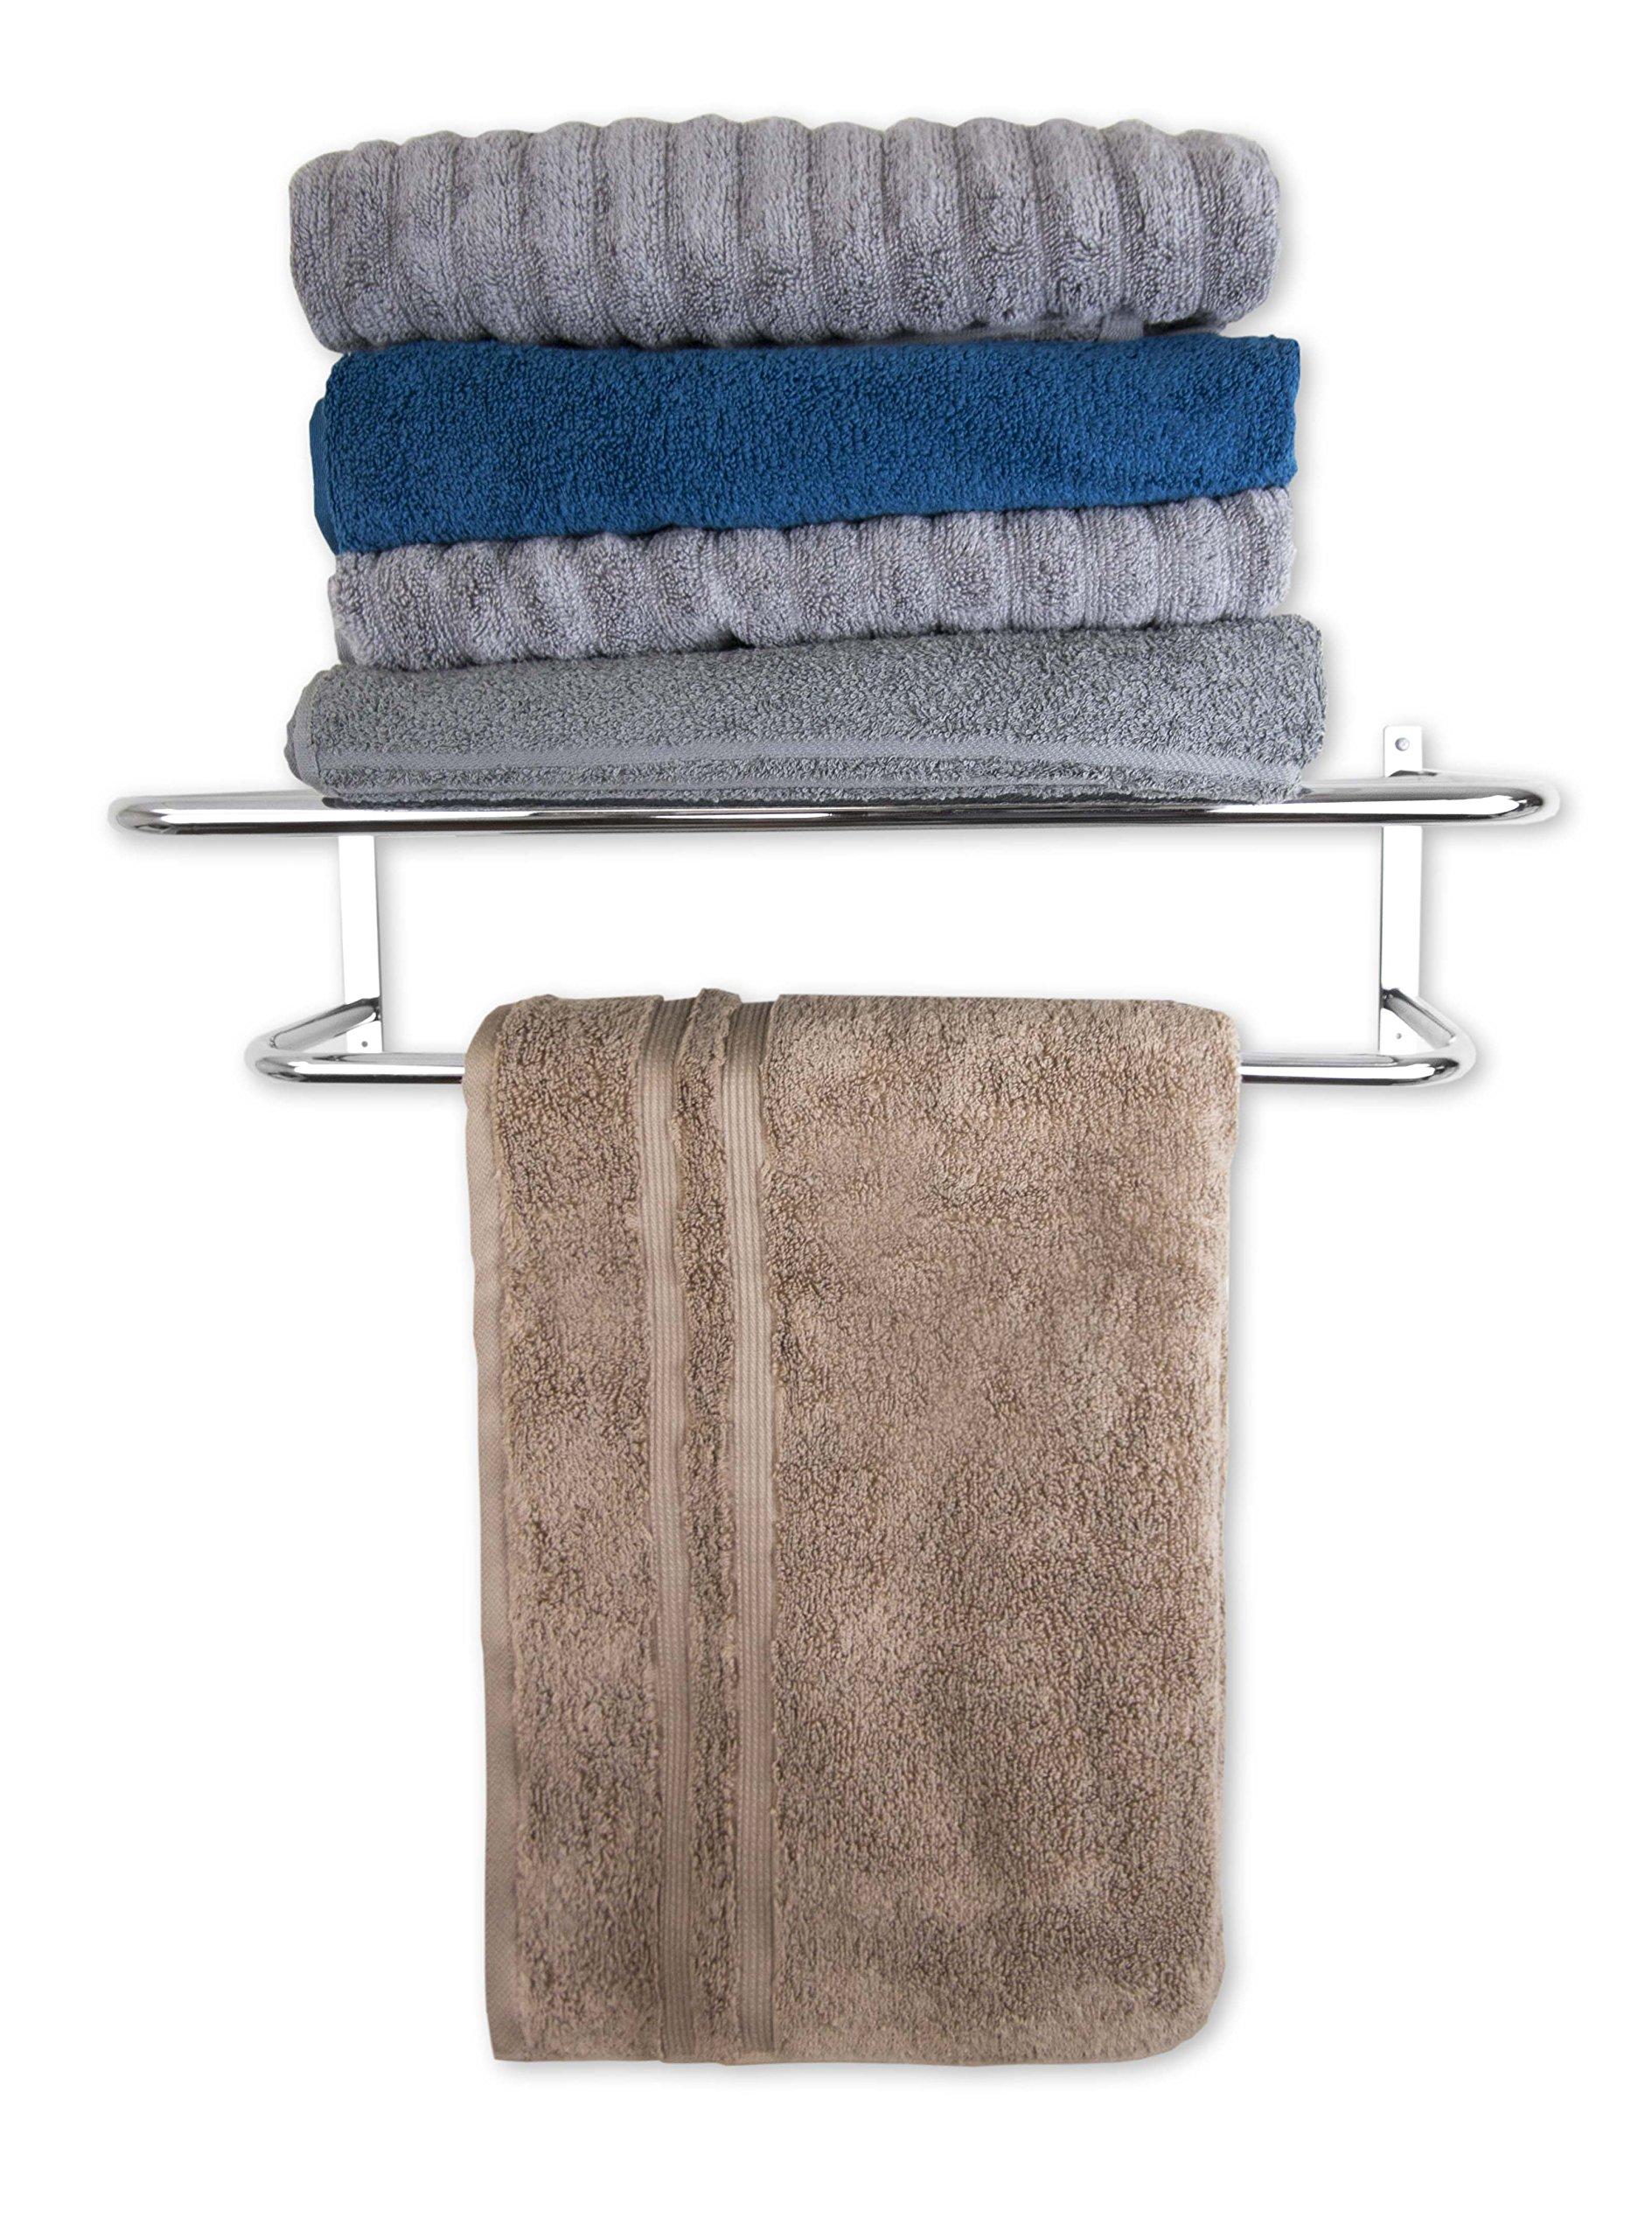 ome Basics 24 Inch Wall Mount Hotel Style Bathroom Shelf with Towel Bar Rack, Silver Chrome